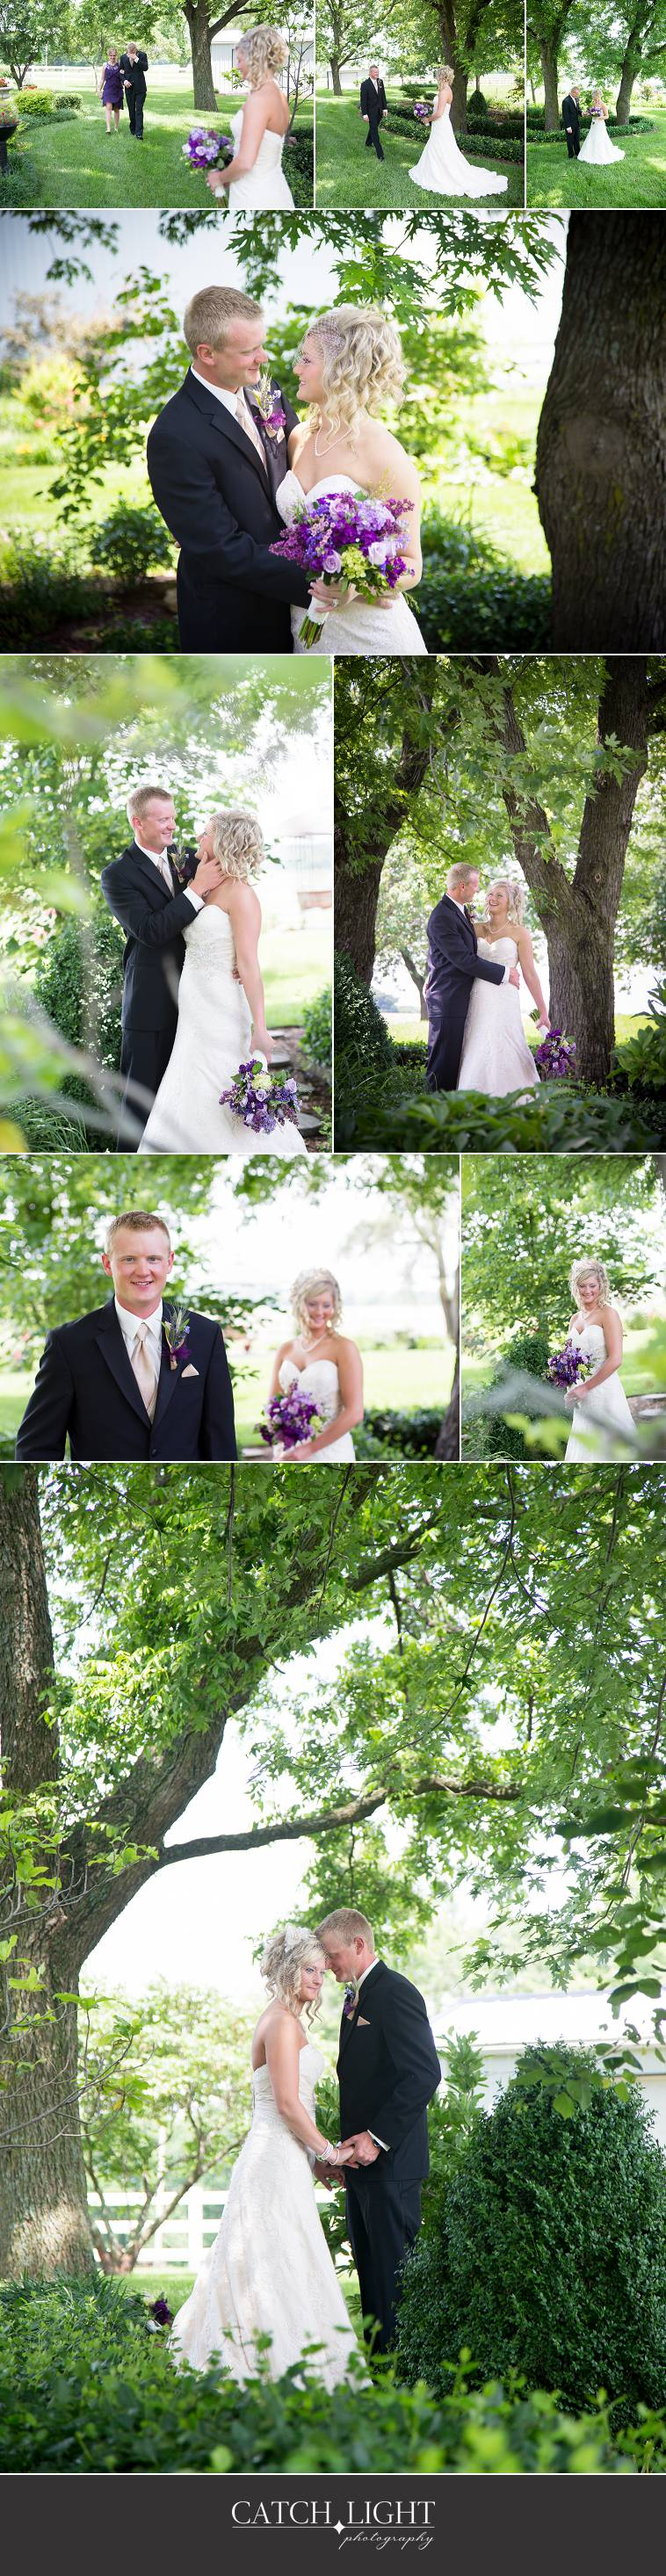 03_Kansas City wedding photos